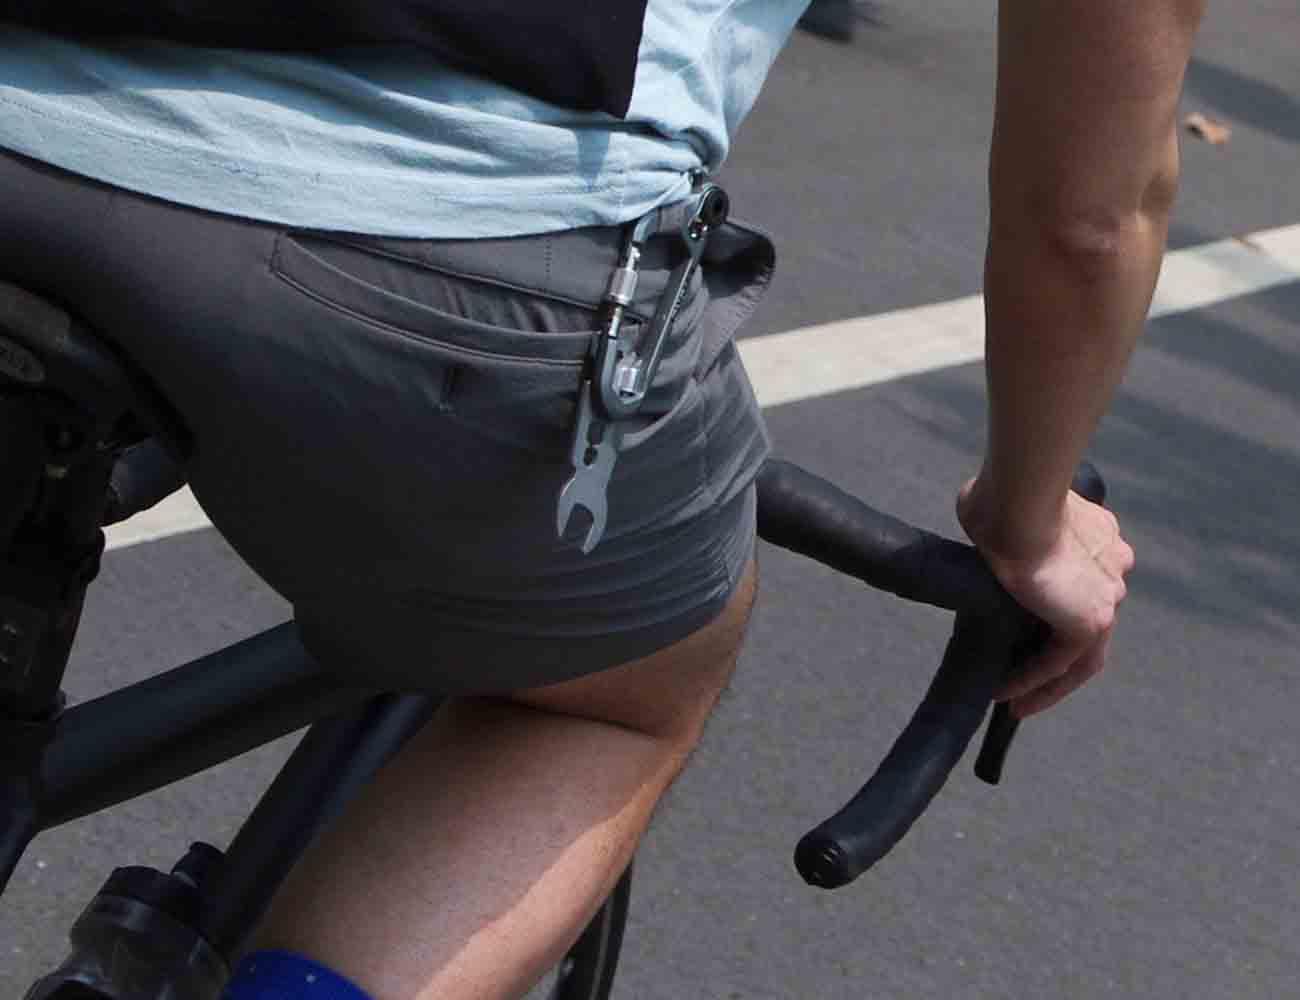 WOHO WOKit Carabiner Cycling Multi-Tool